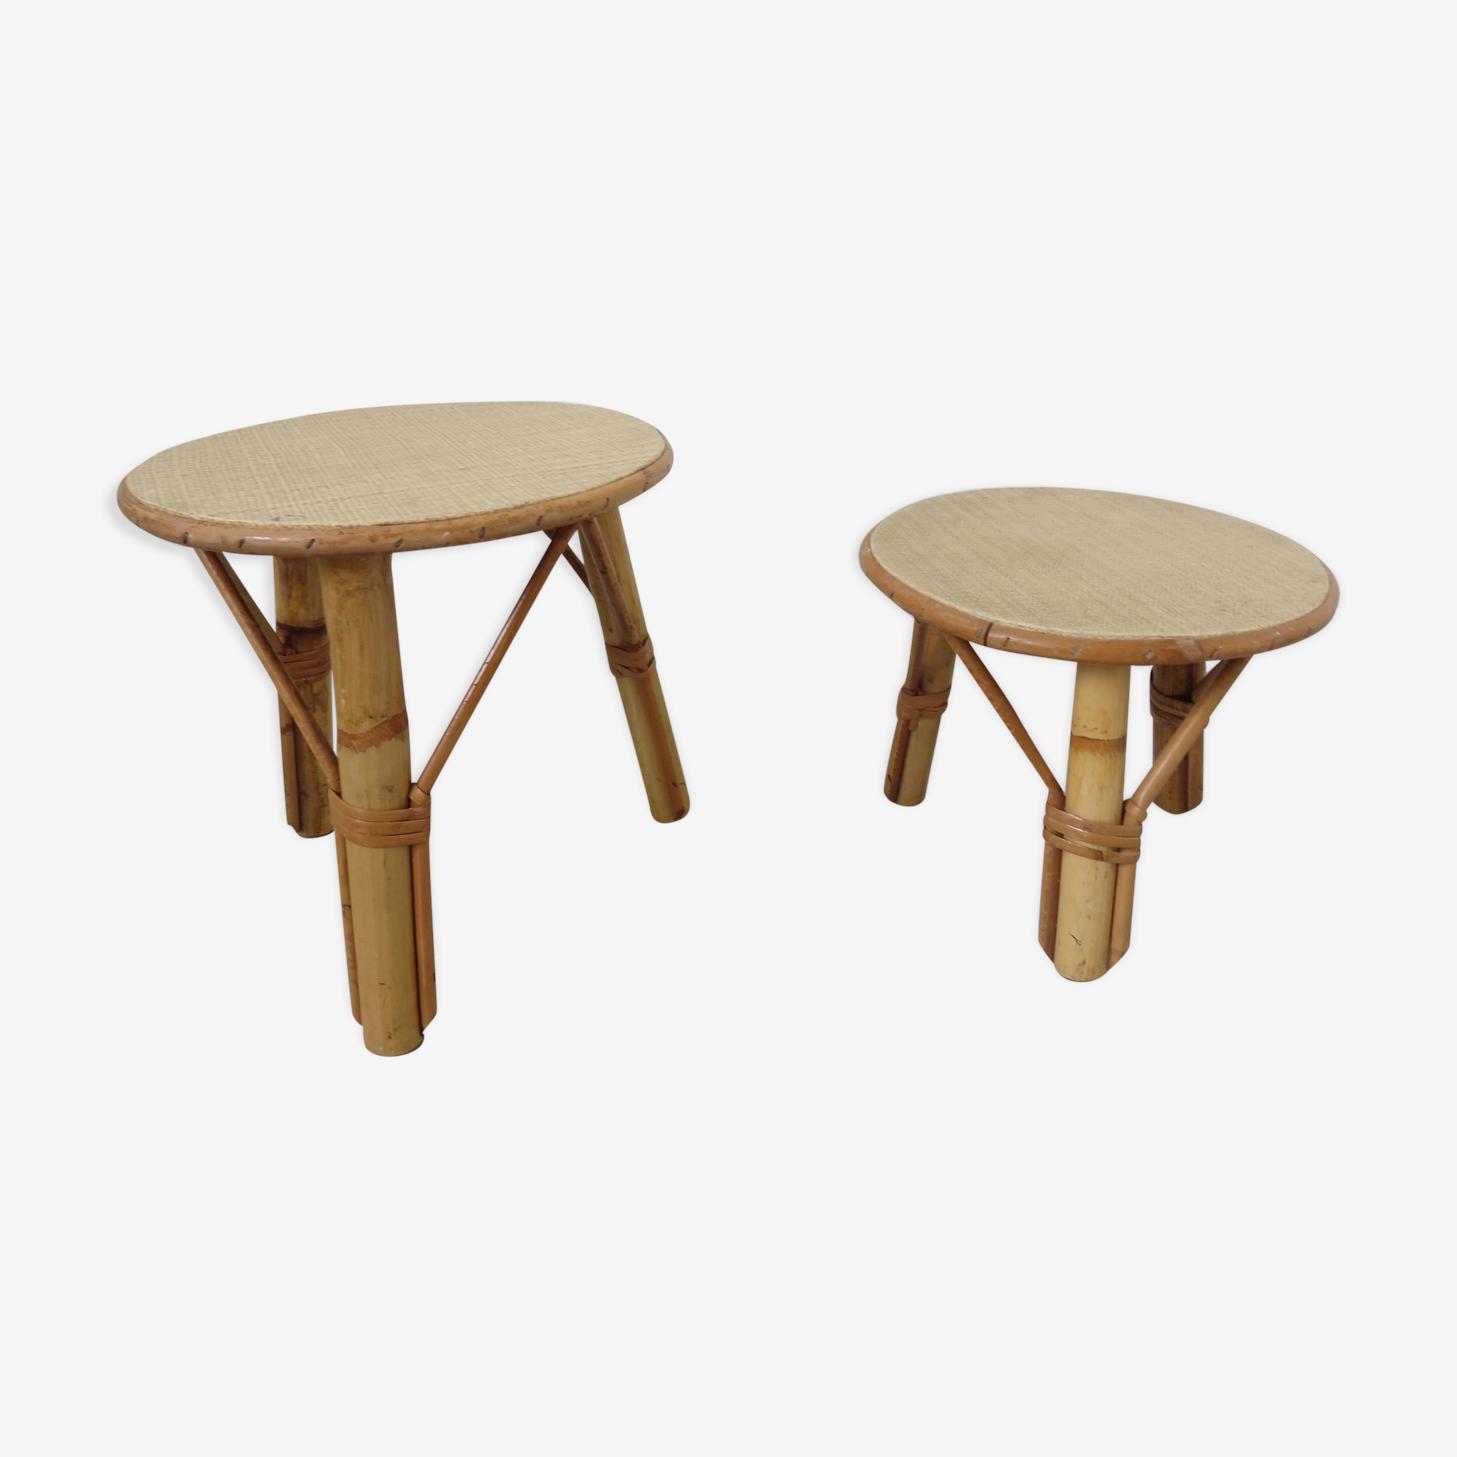 2 tables tripodes en rotin années 60/70